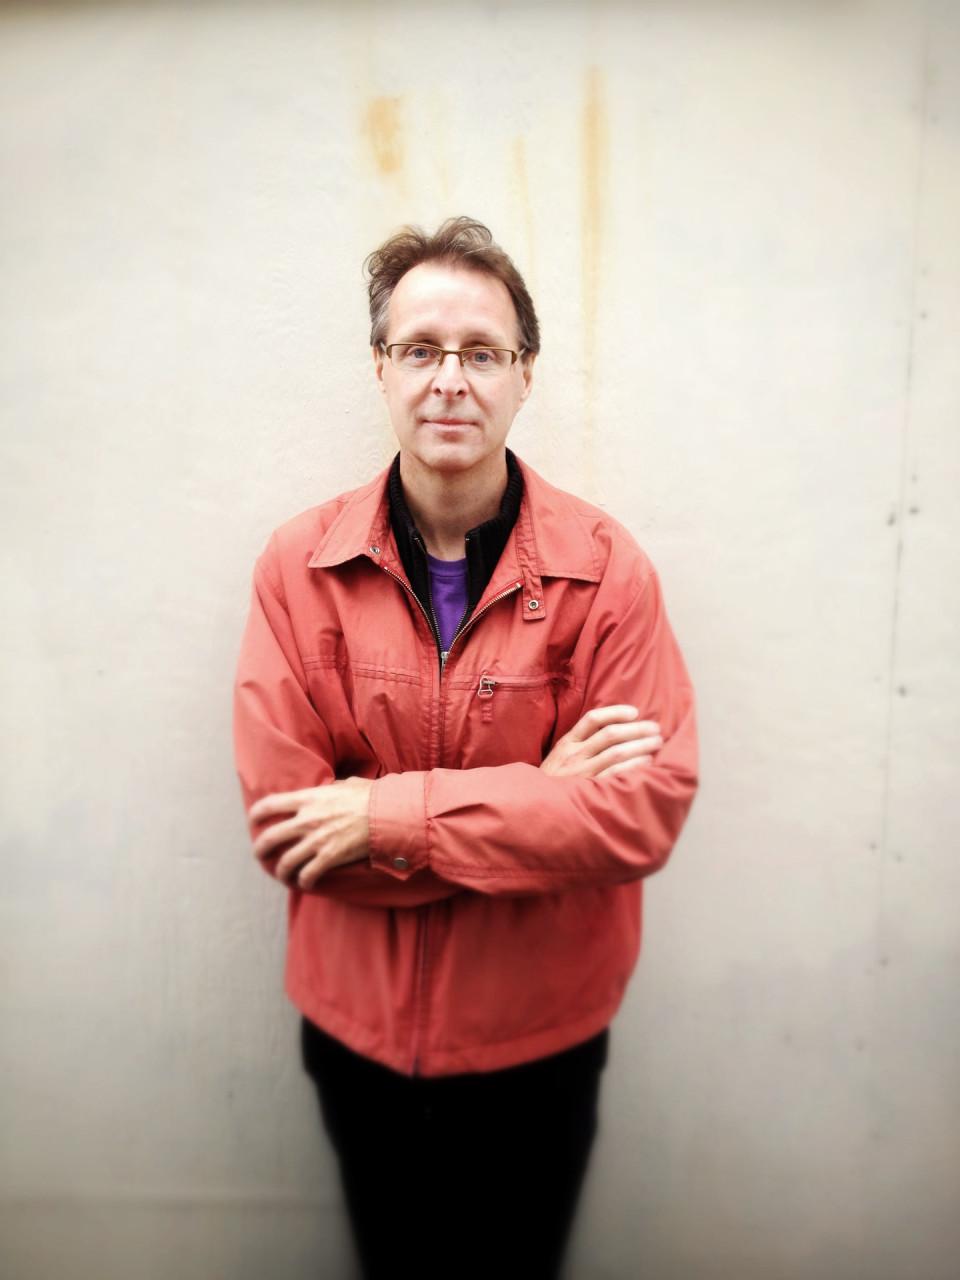 Jean-François Denis [Photograph: Mark Mushet, Vancouver (British Columbia, Canada), June 20, 2013]